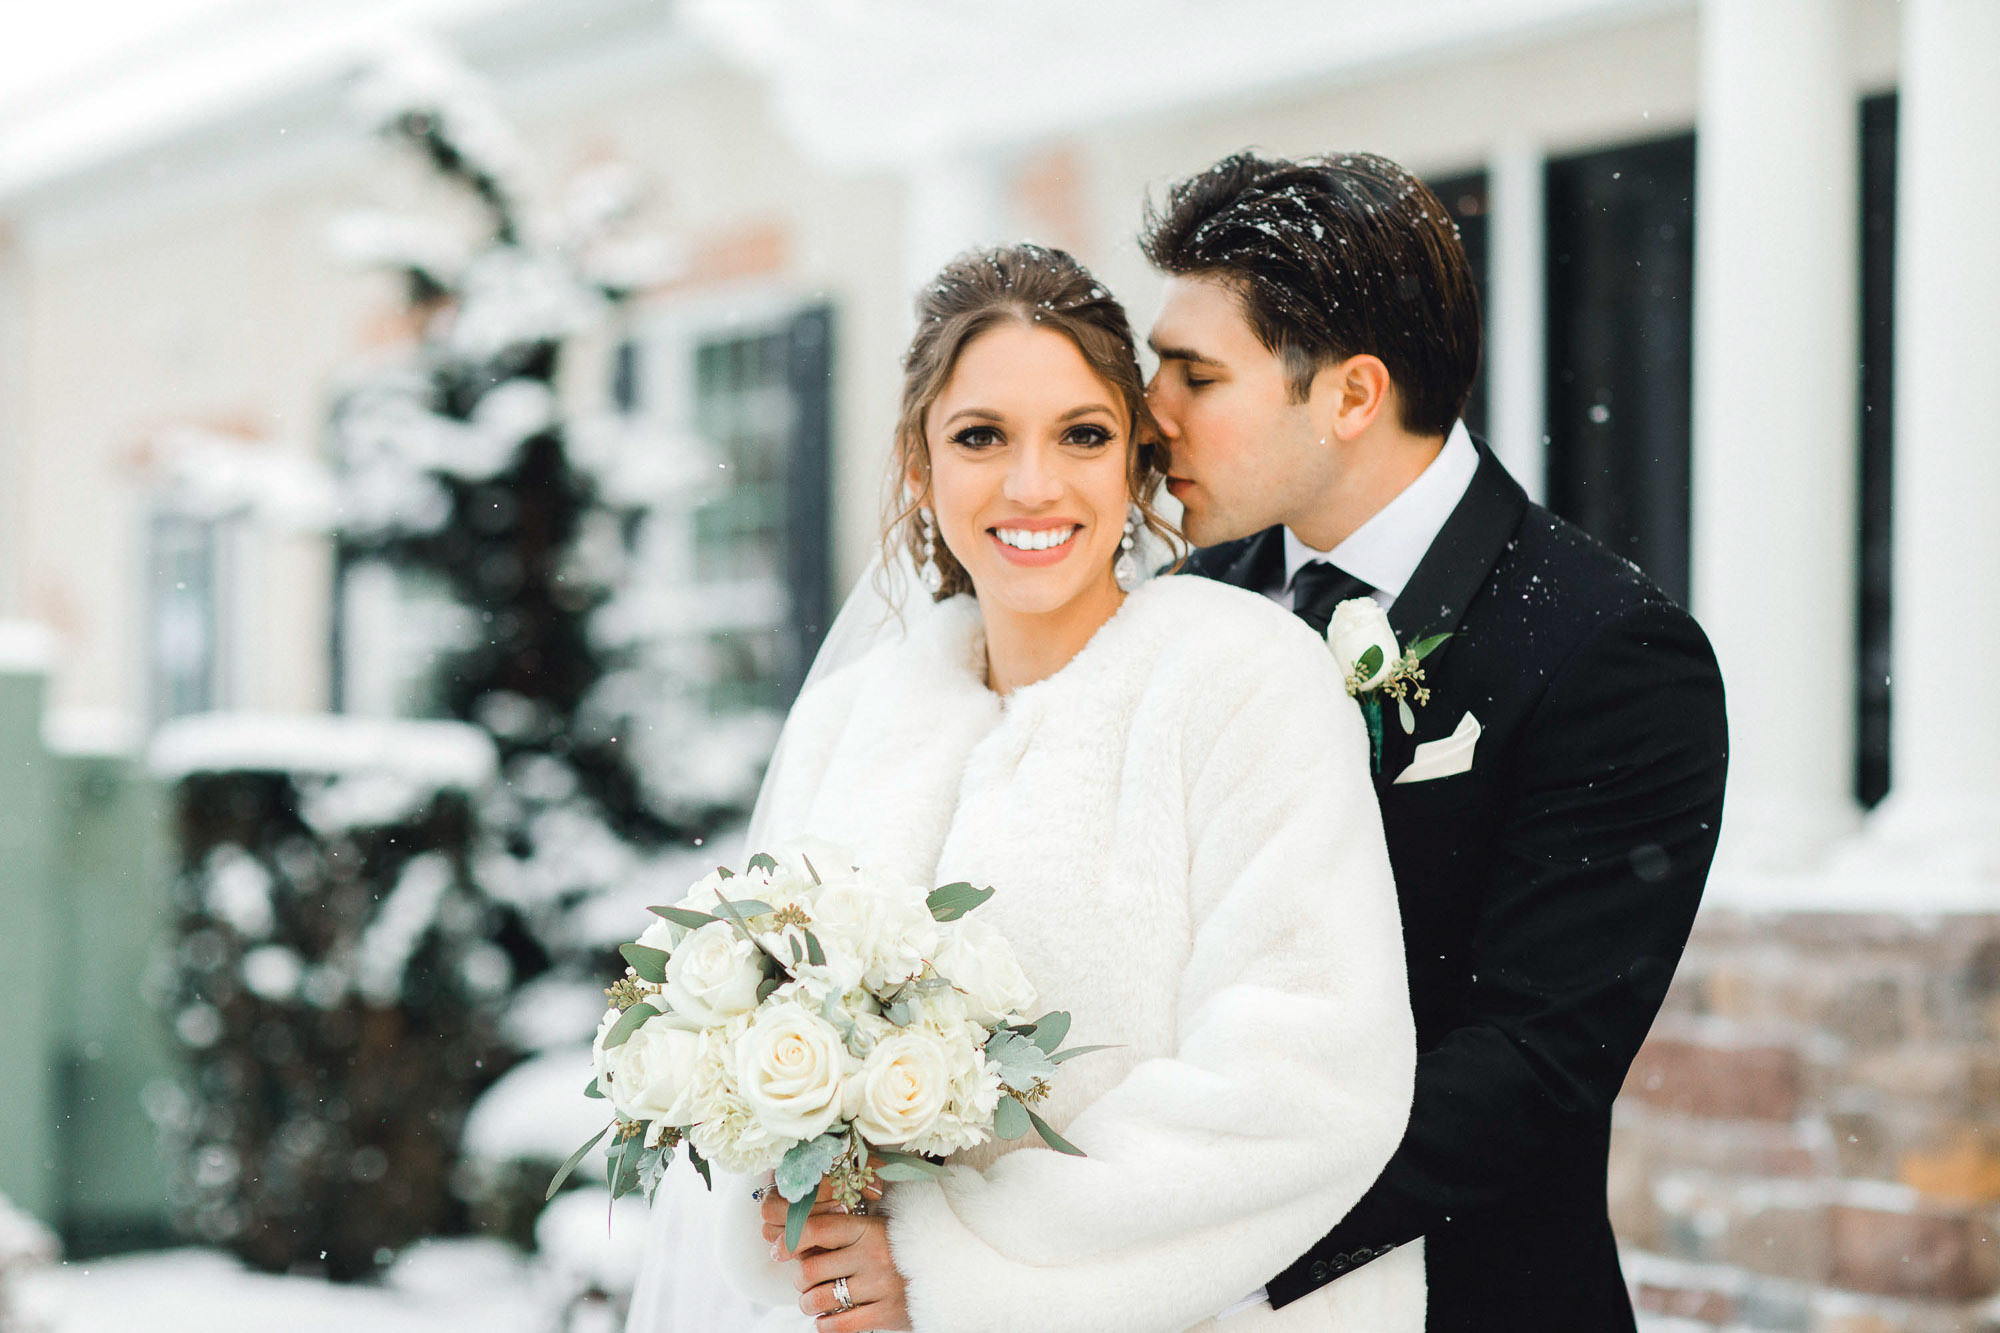 snowy-sand-springs-country-club-drums-pa-christmas-wedding-24686.jpg